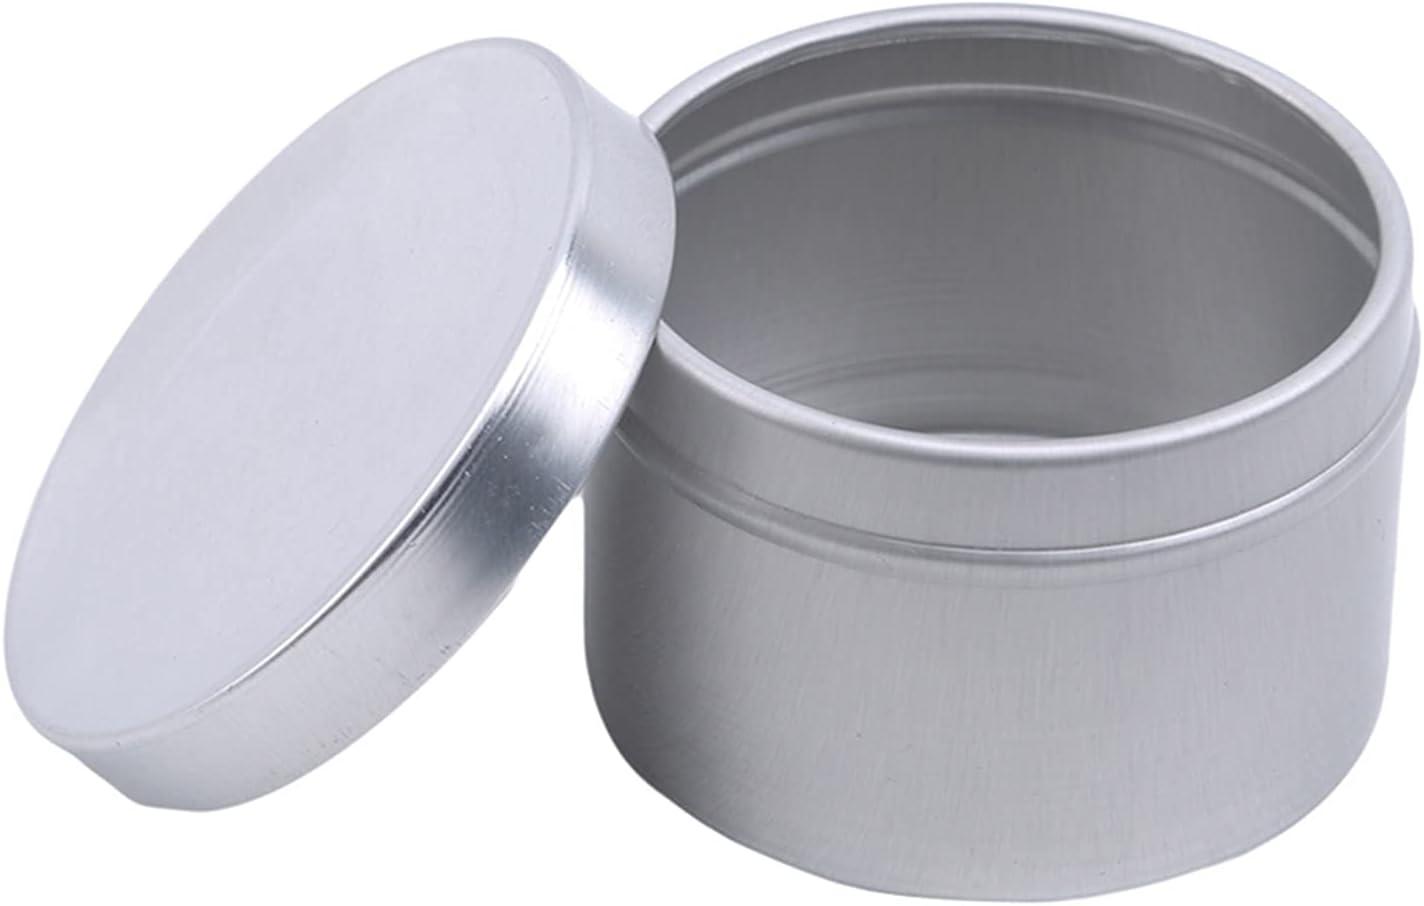 JSJJQAZ Storage Tank 1 Piece Max 69% OFF cans Tea Cheap bargain Coffee Sealed Box